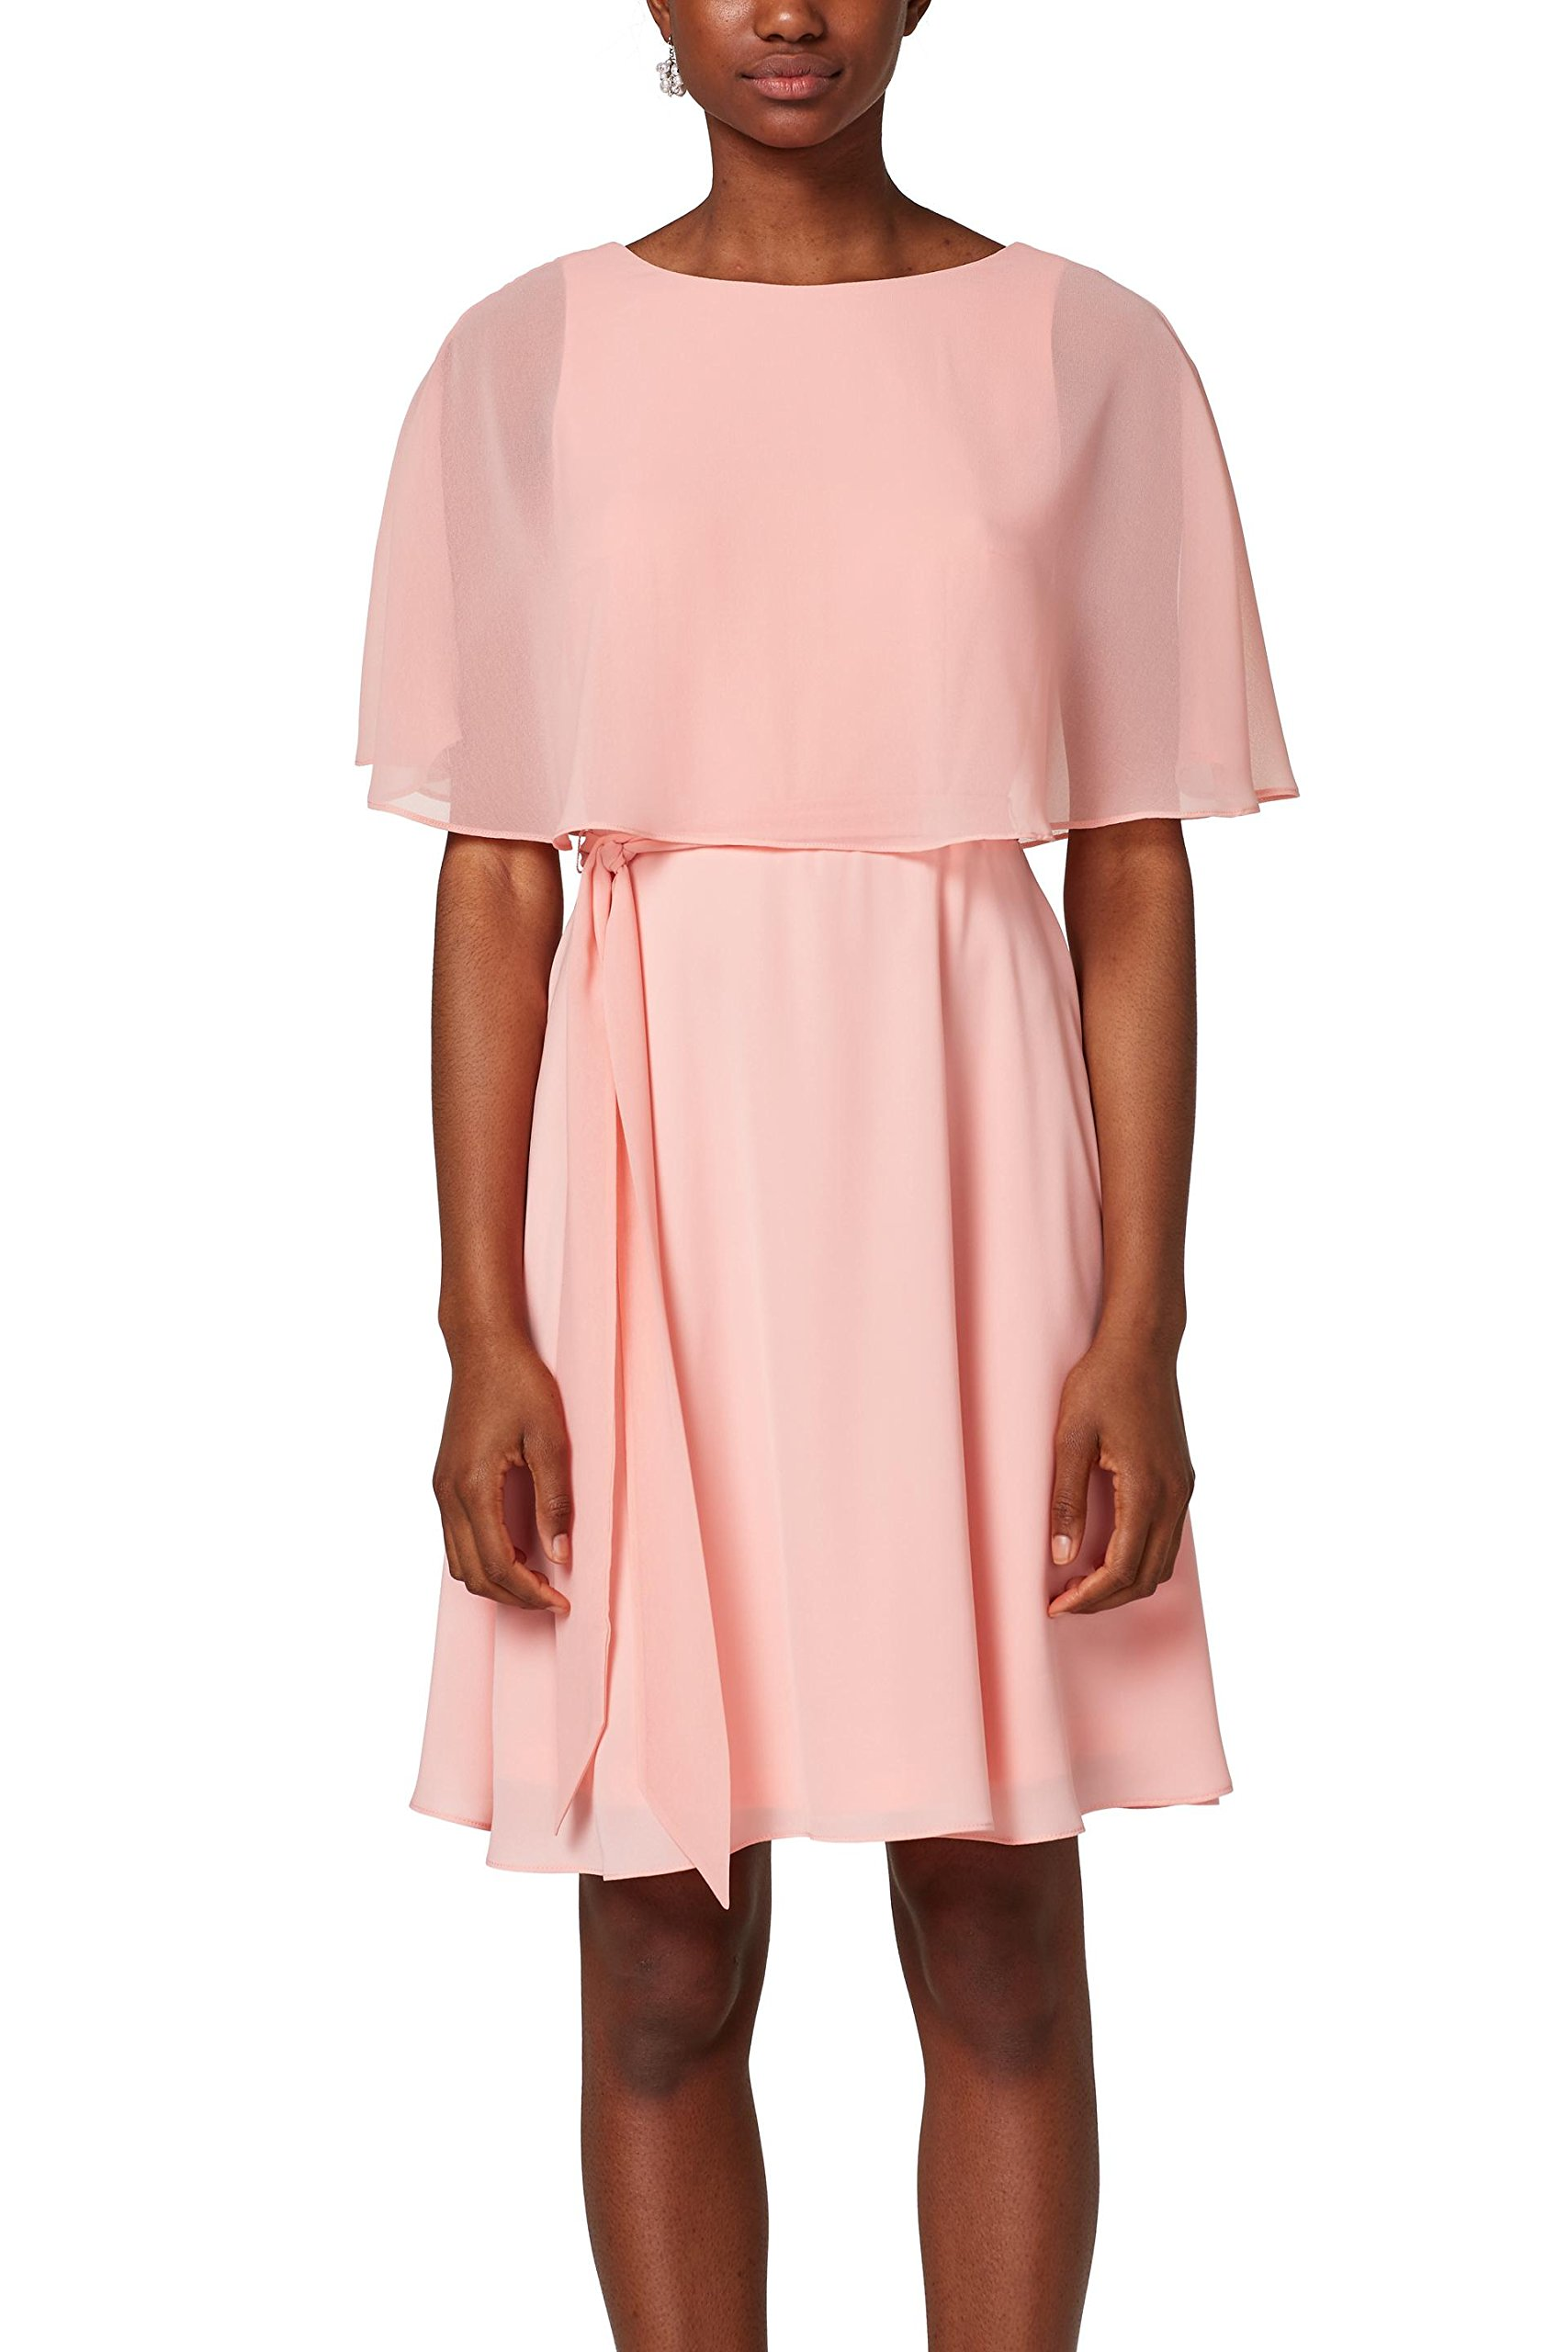 Collection SoiréeRoselight 69044 028eo1e032 De Pink Esprit Robe Femme 0wOmPyvN8n